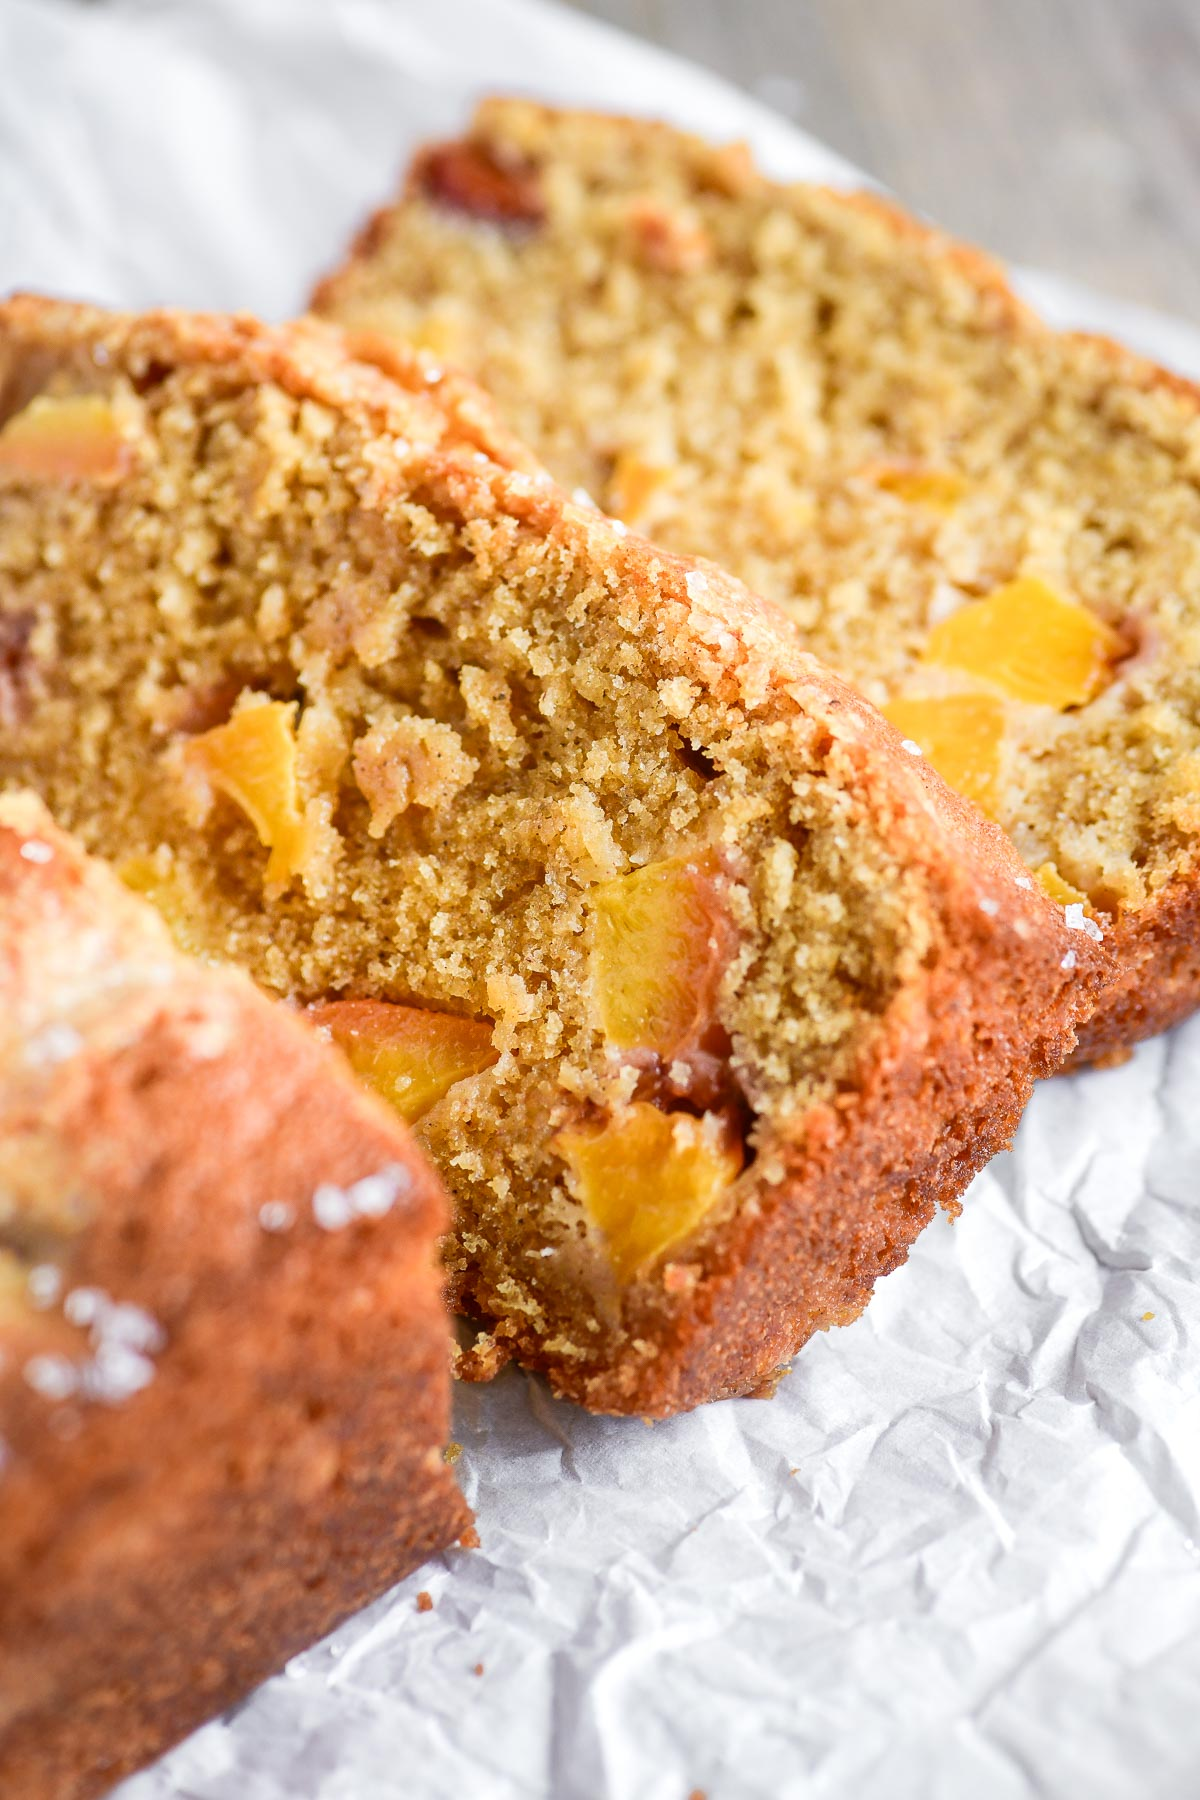 Spiced peach bread, sliced